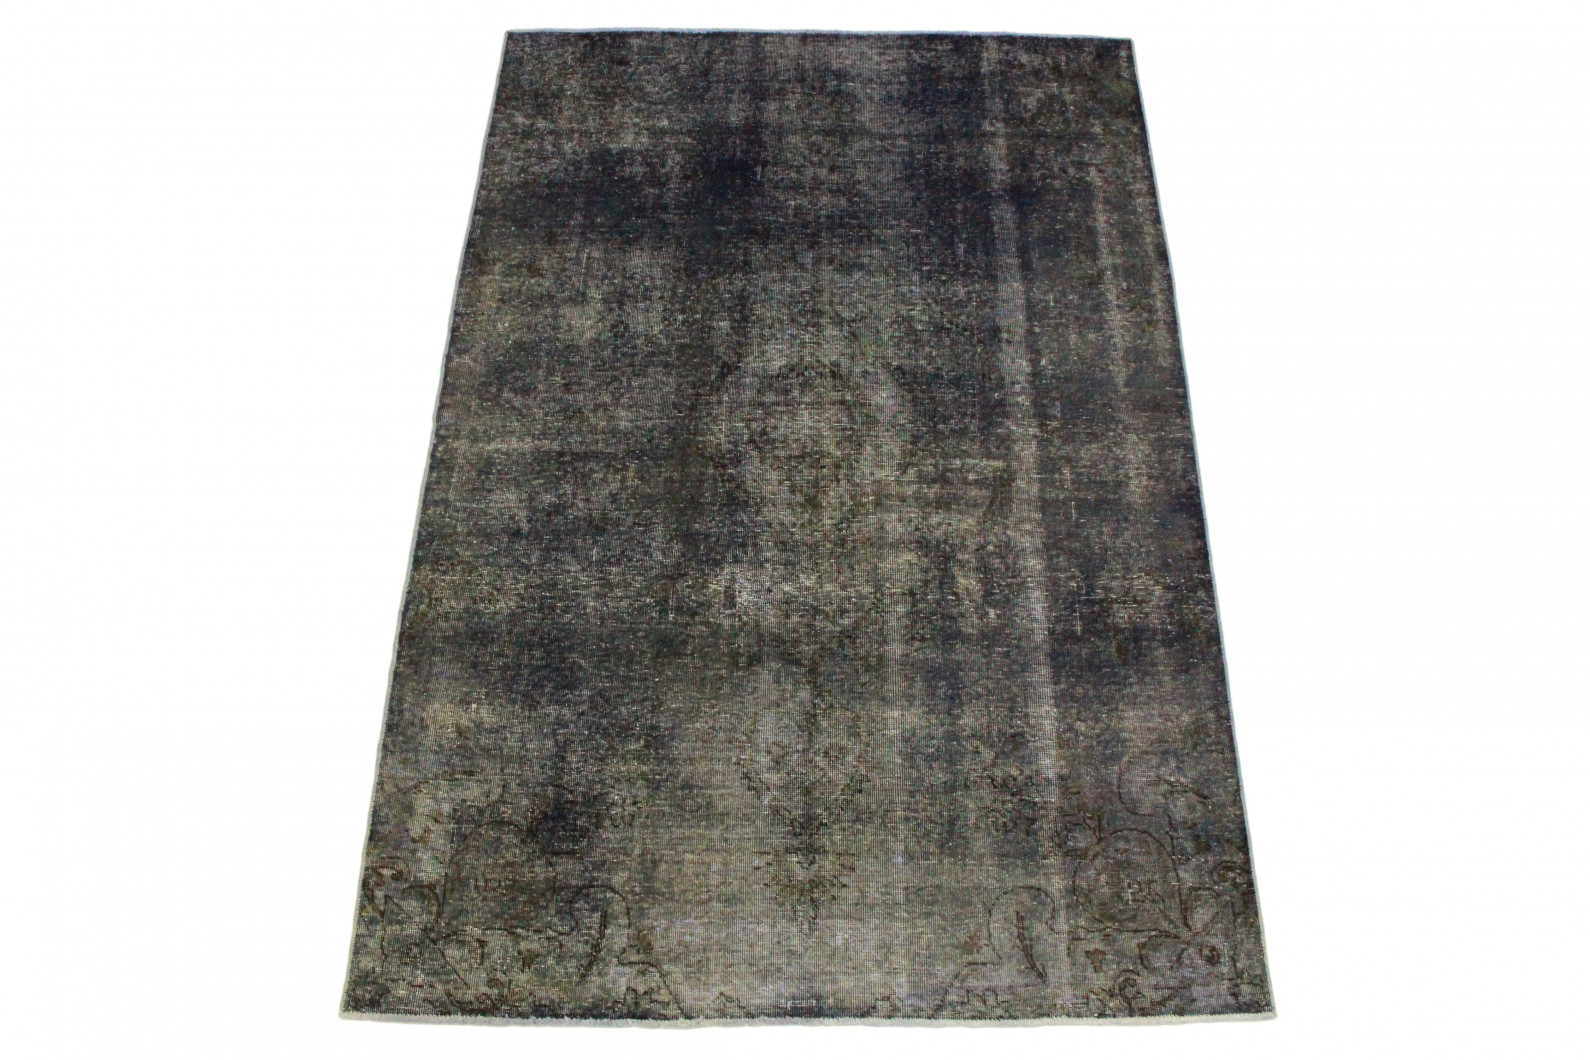 vintage teppich blau grau in 250x170 1001 3513 bei. Black Bedroom Furniture Sets. Home Design Ideas